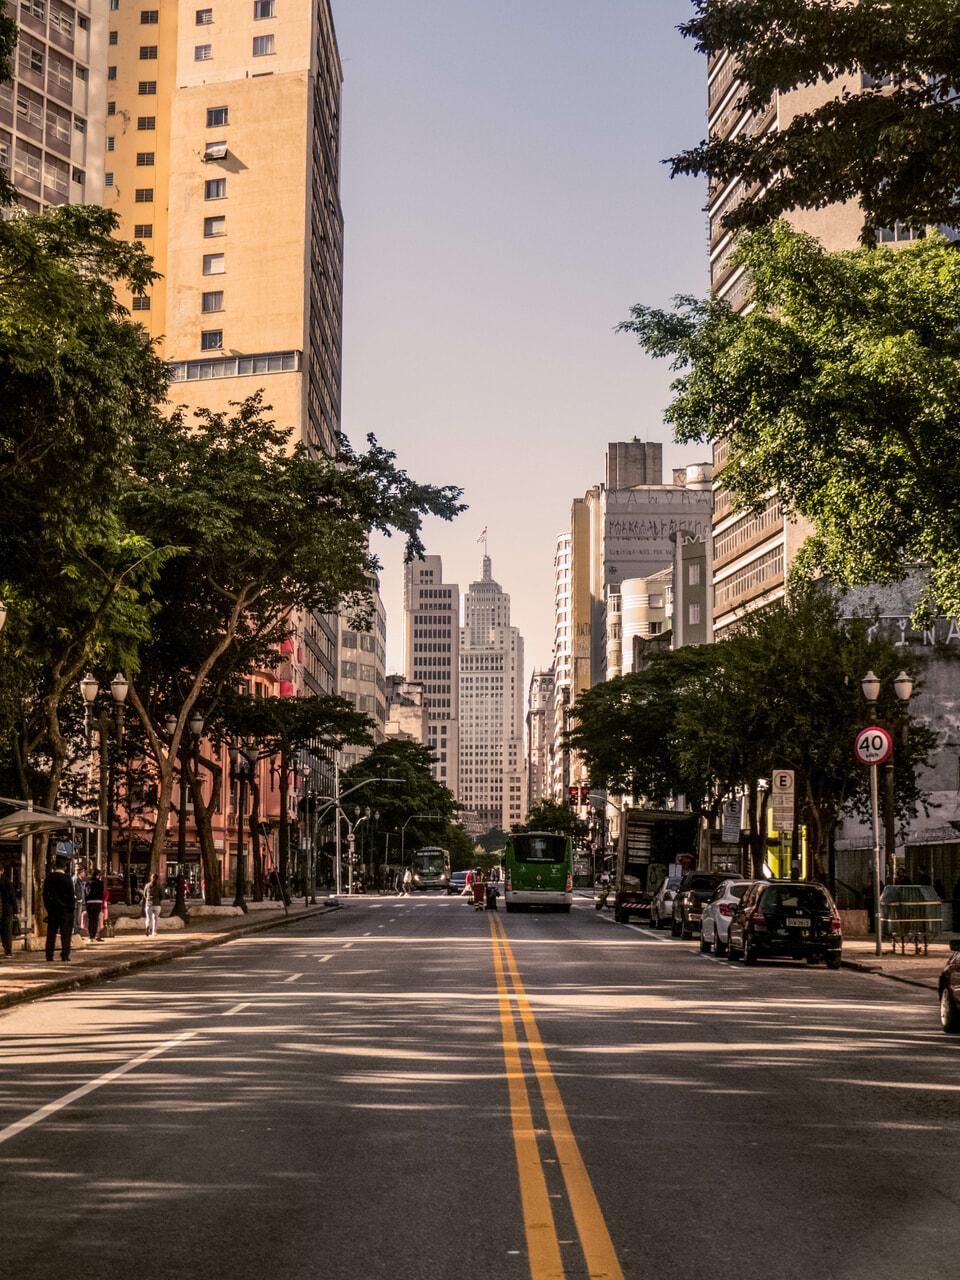 brasil, sp, and street image